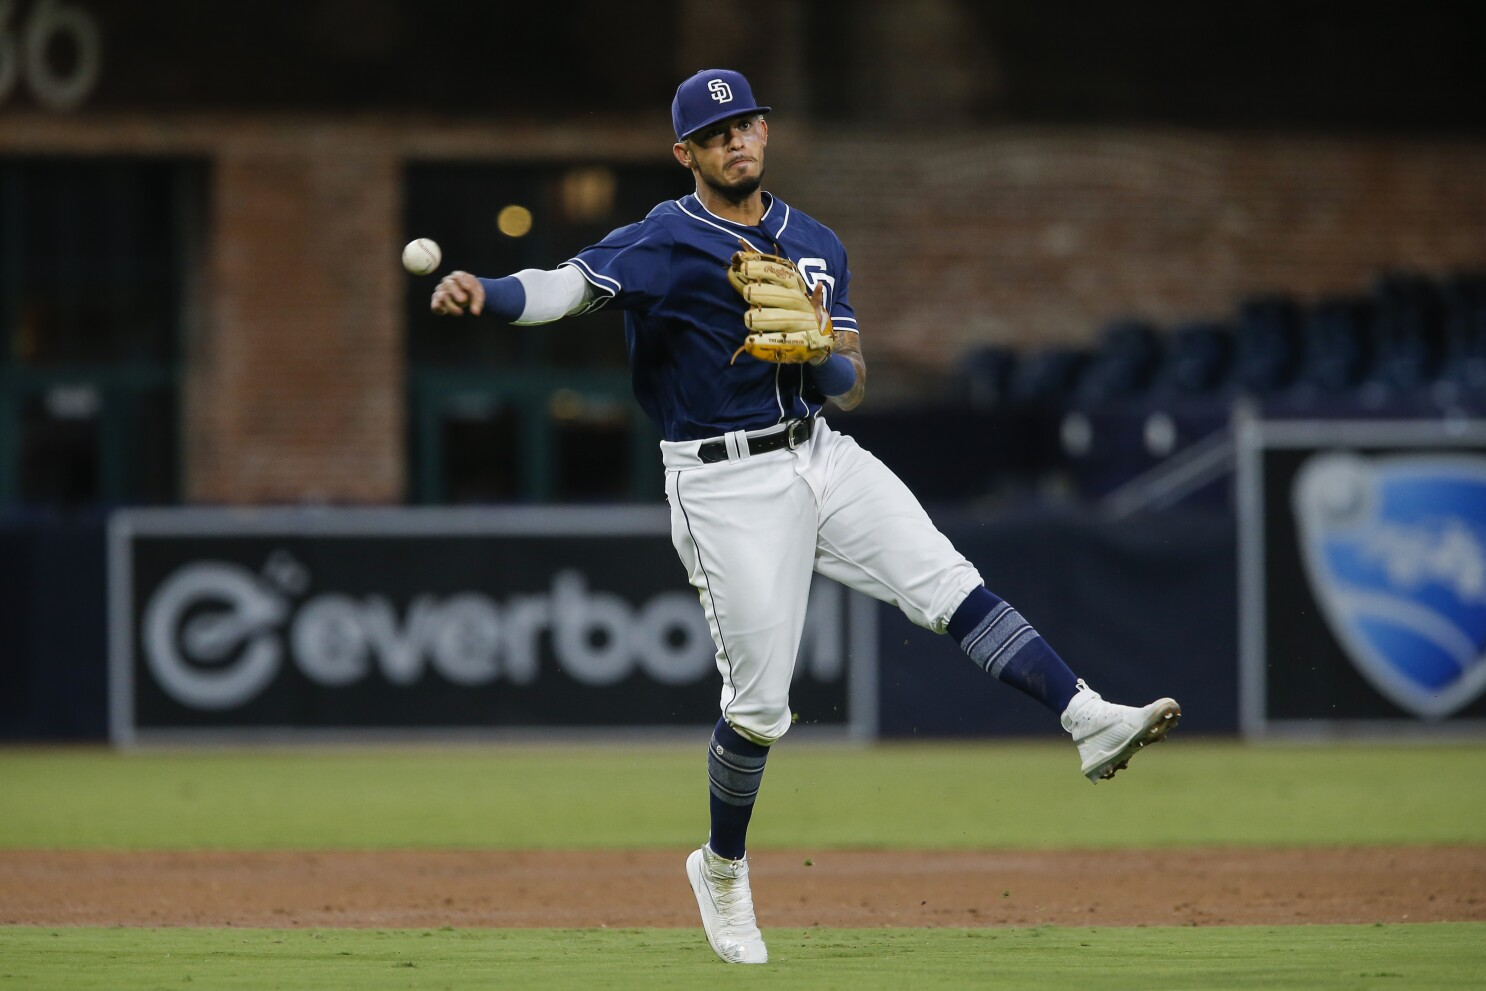 Resultado de imagen para Gabriel Arias baseball